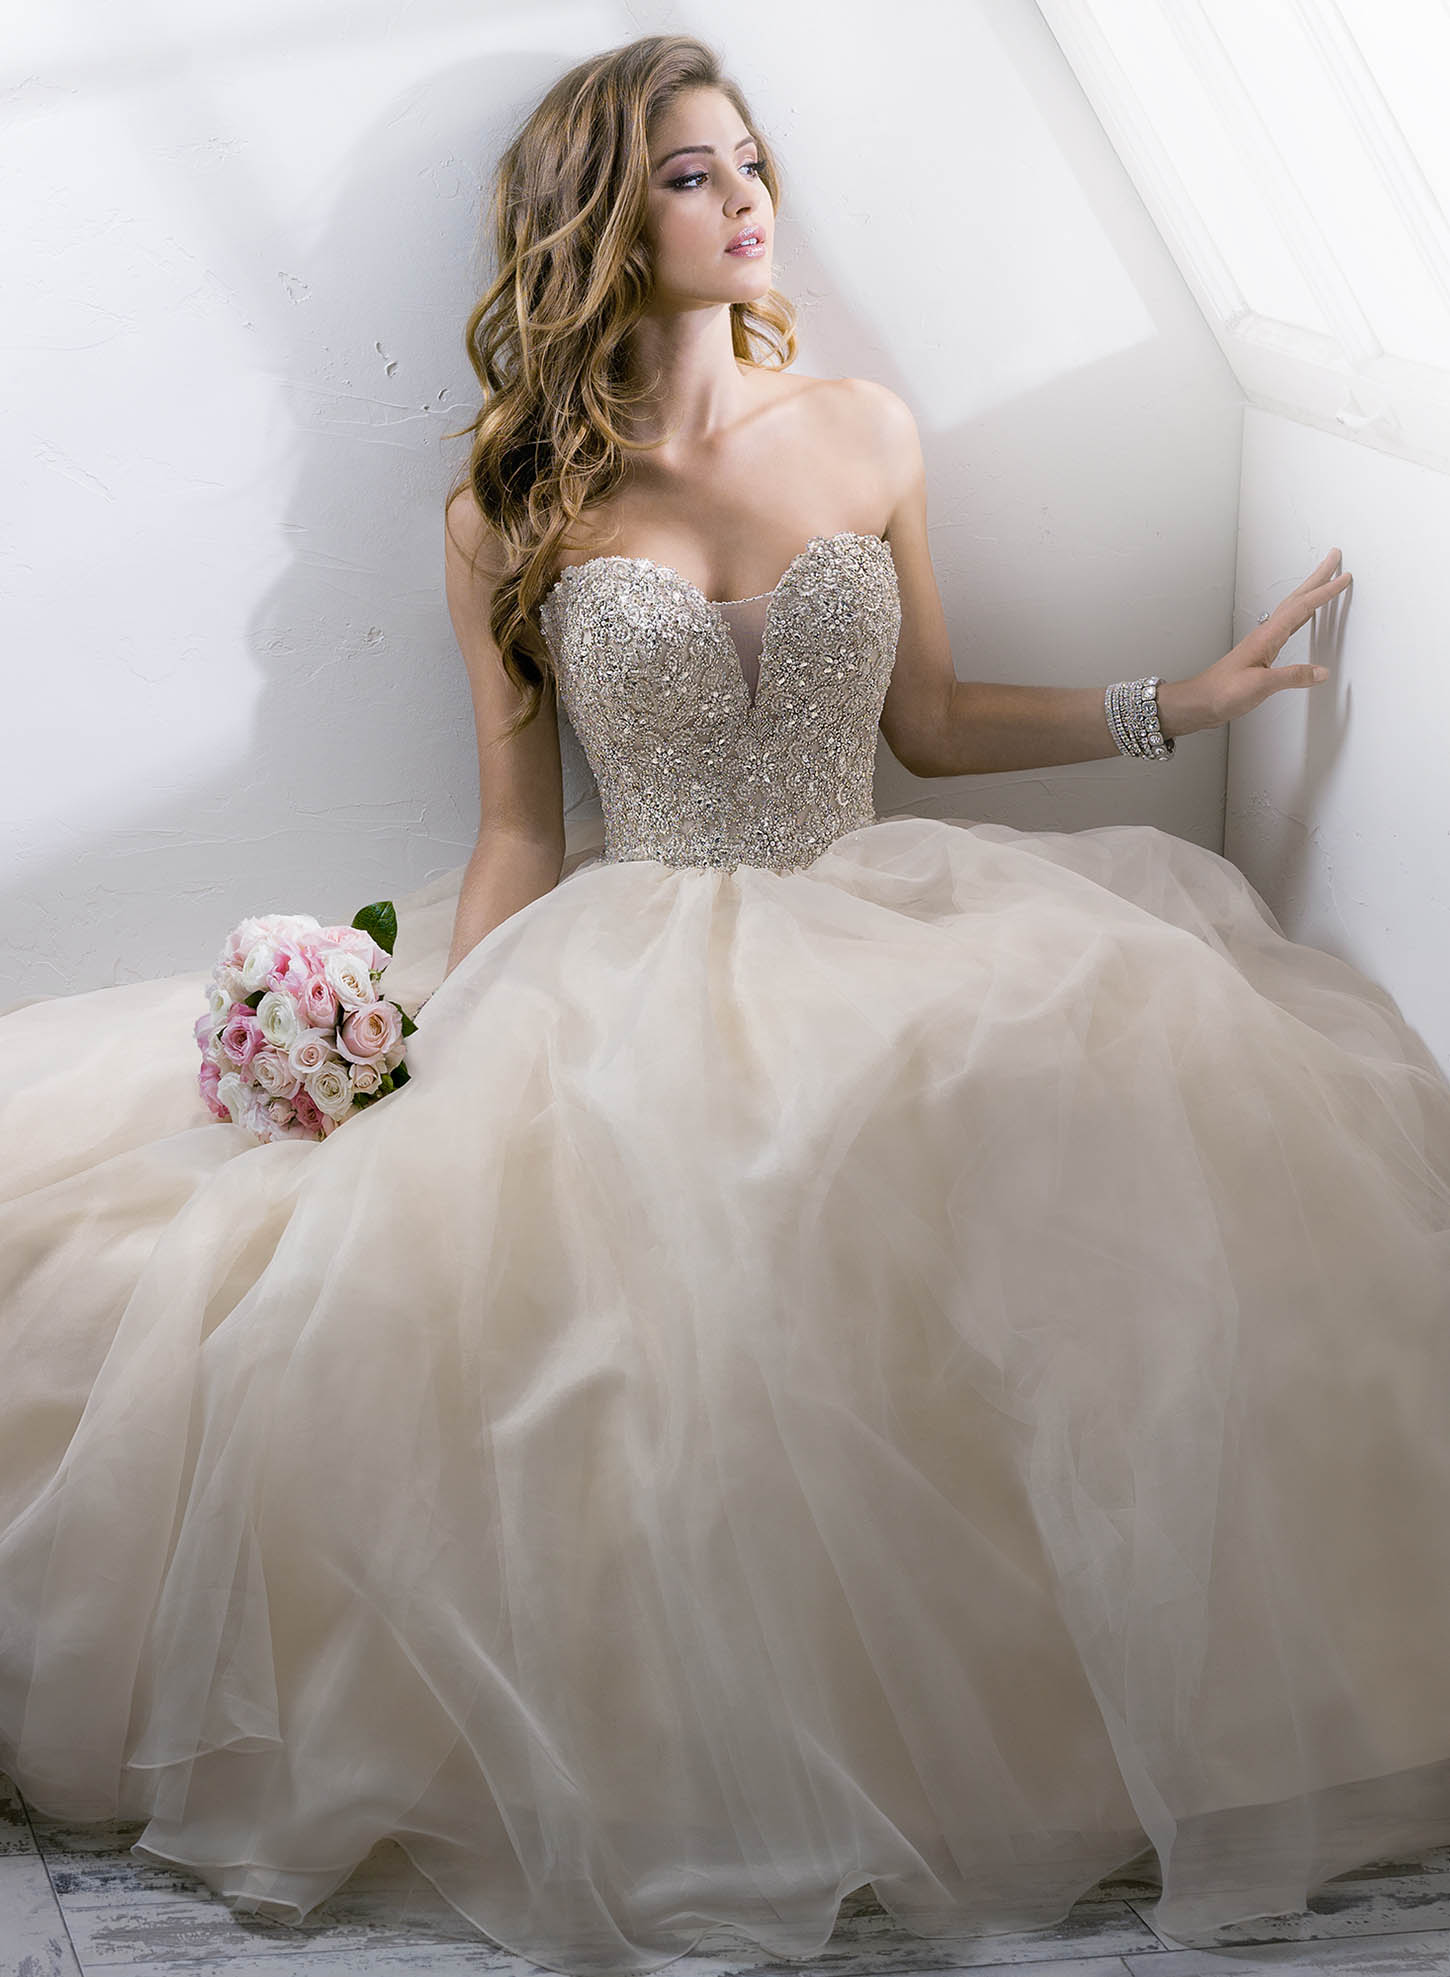 O Aluguel de Vestido de Noiva